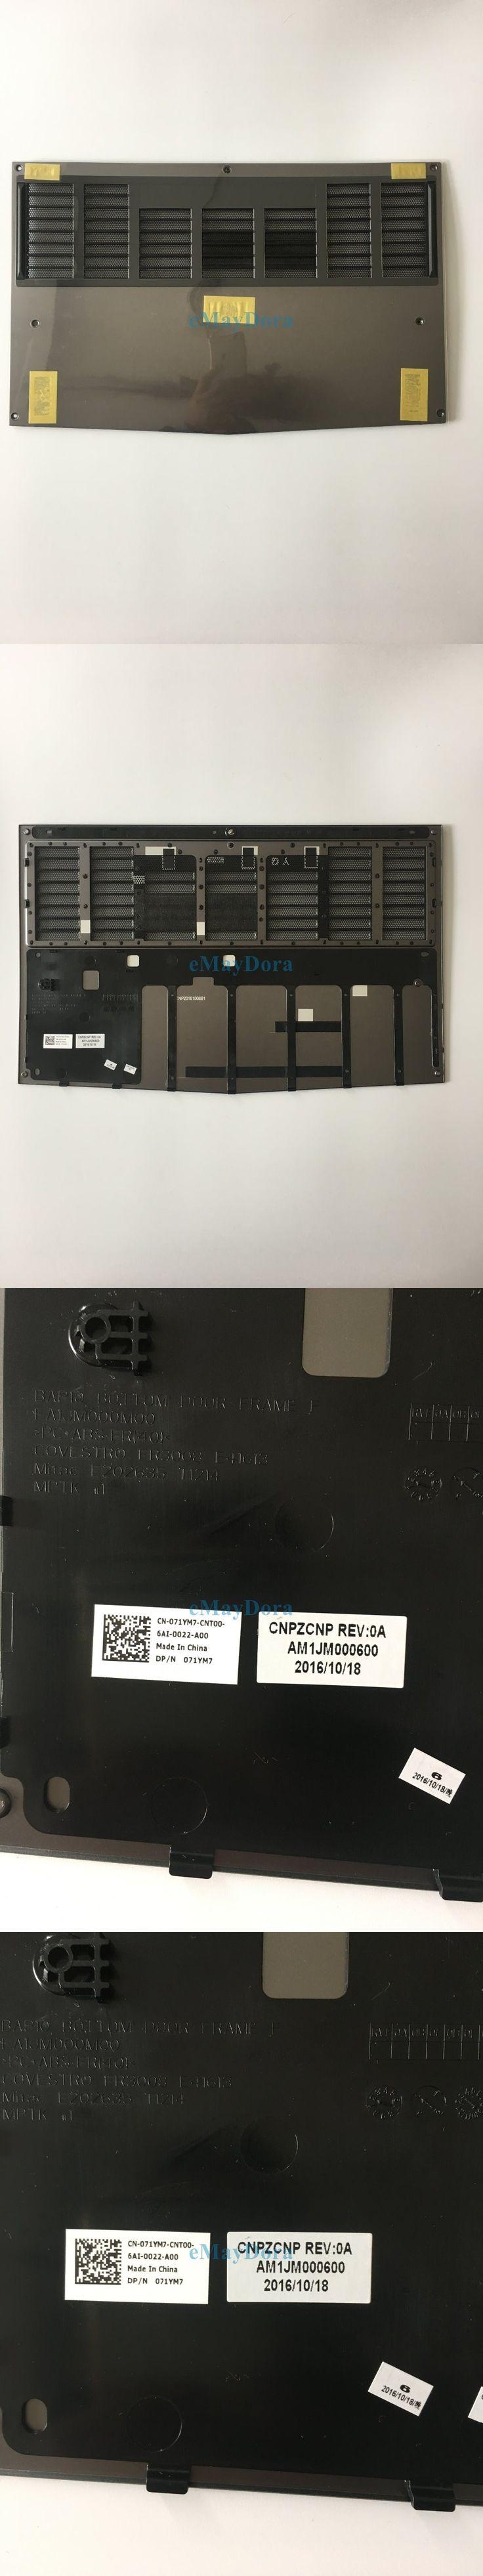 NEW emay GAAHOO laptop parts for DELL ALIENWARE 15 R3 BOTTOM DOOR 071YM7  71YM7